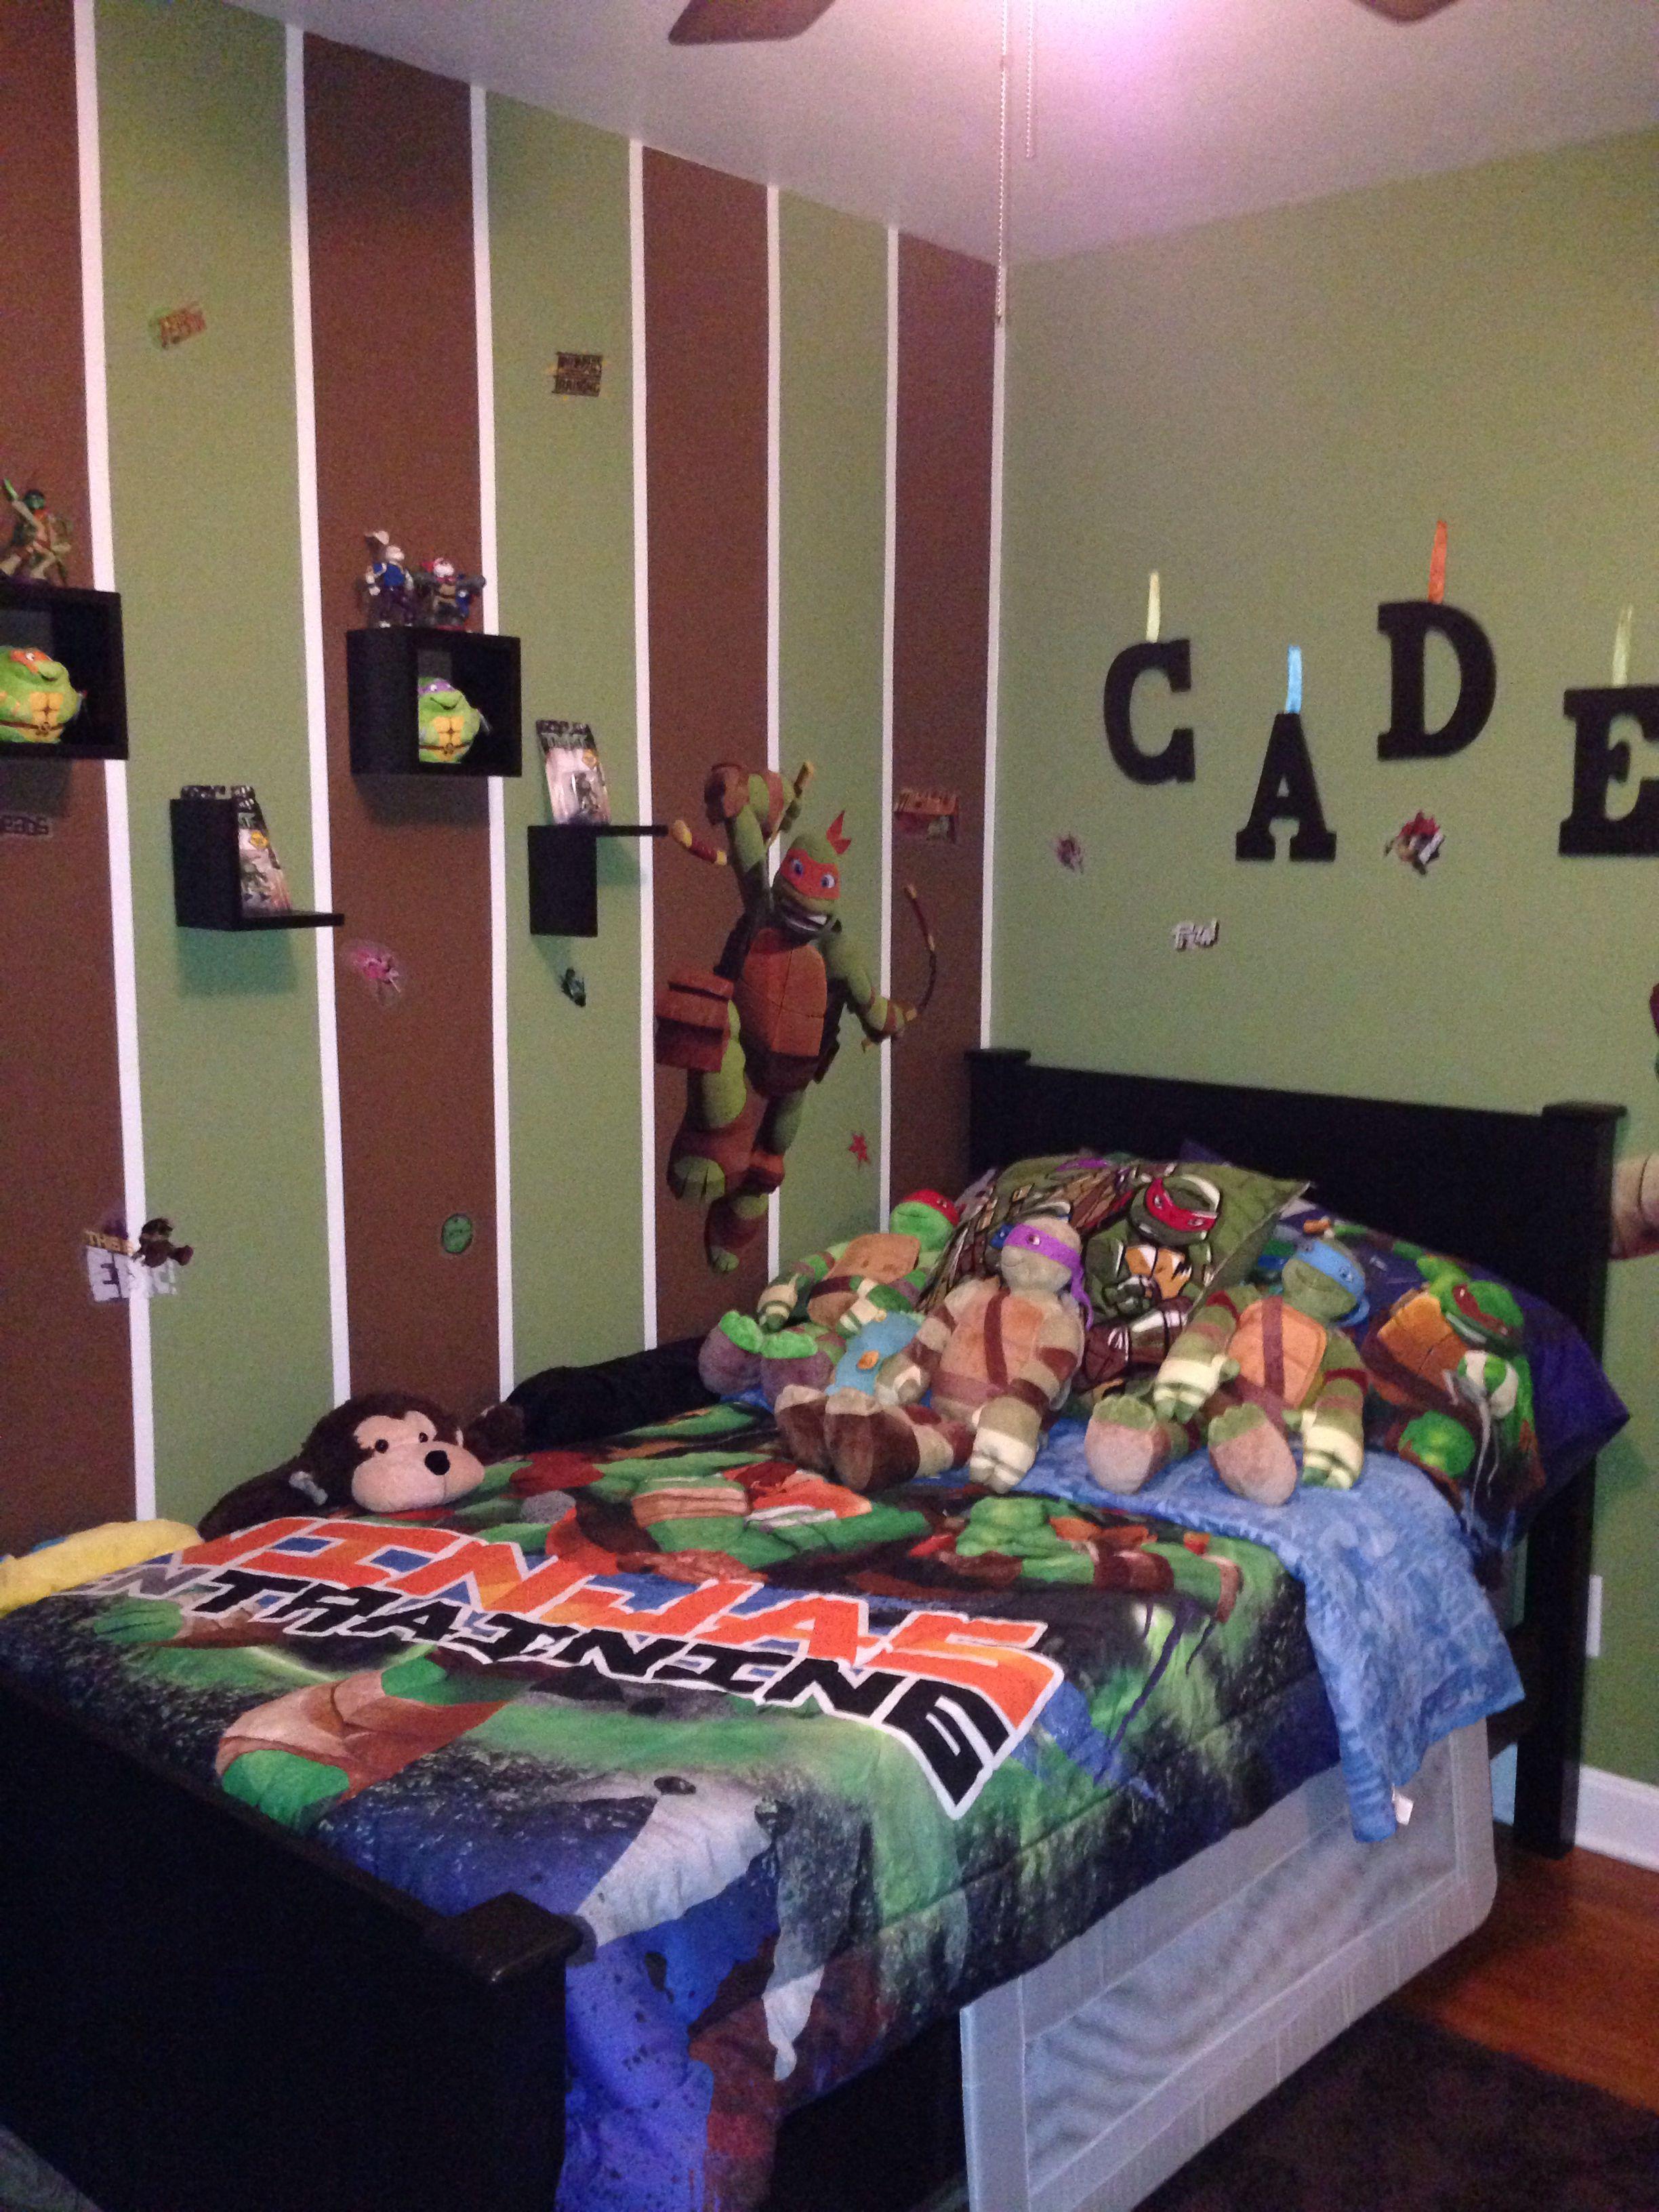 Ninja turtles bedroom  For the Home  Pinterest  Ninja turtle bedroom Bedrooms and Room